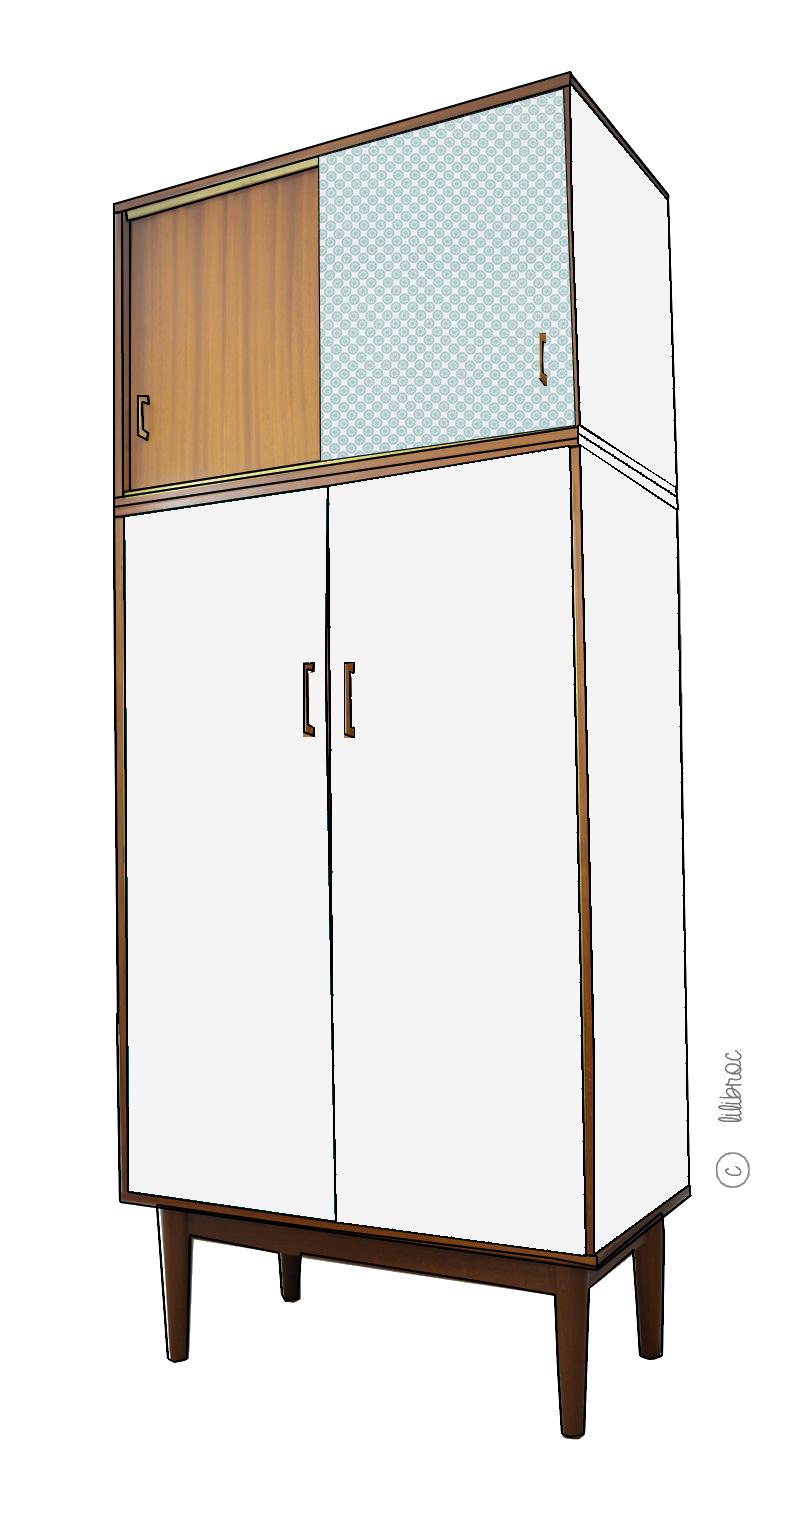 armoire-vintage-philomene-croquis-7